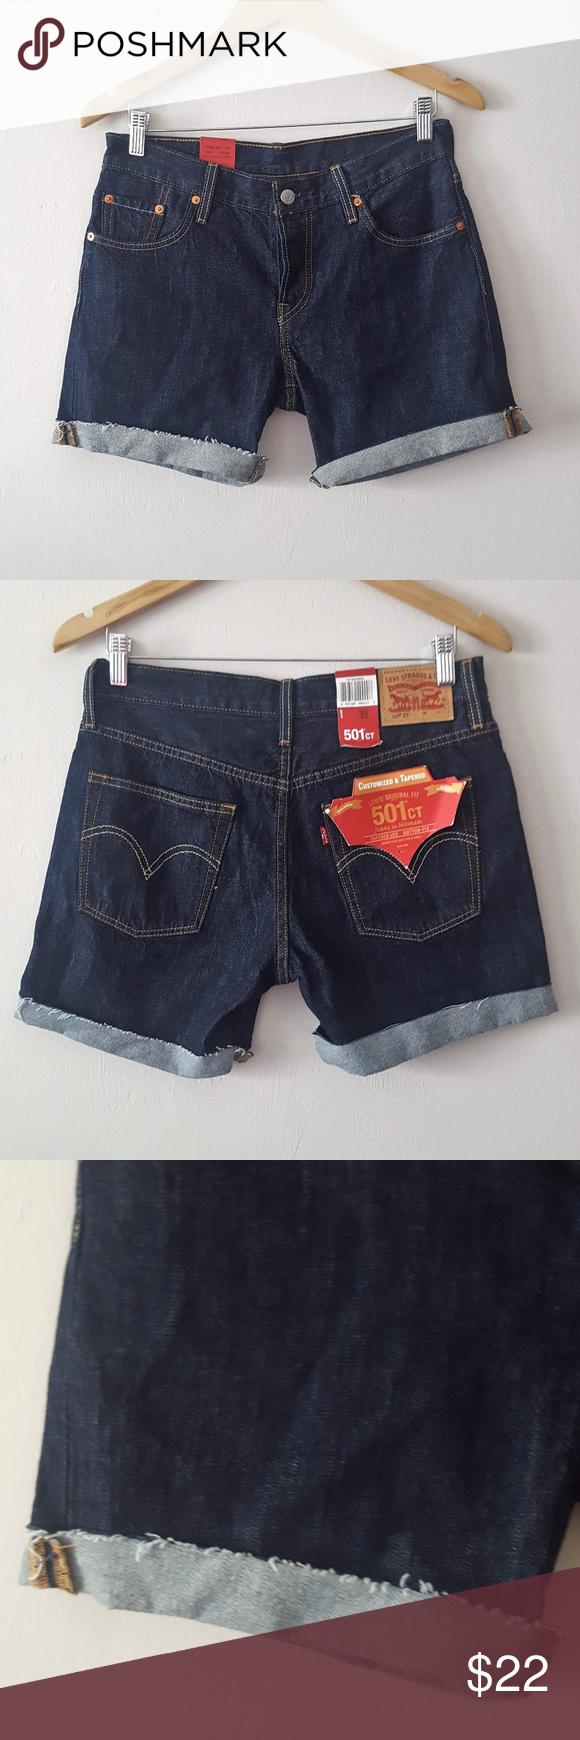 e390909b I just added this listing on Poshmark: NWT LEVI'S 501CT BUTTON FLY CUT OFF  DENIM SHORTS. #shopmycloset #poshmark #fashion #shopping #style #forsale # Levi's ...